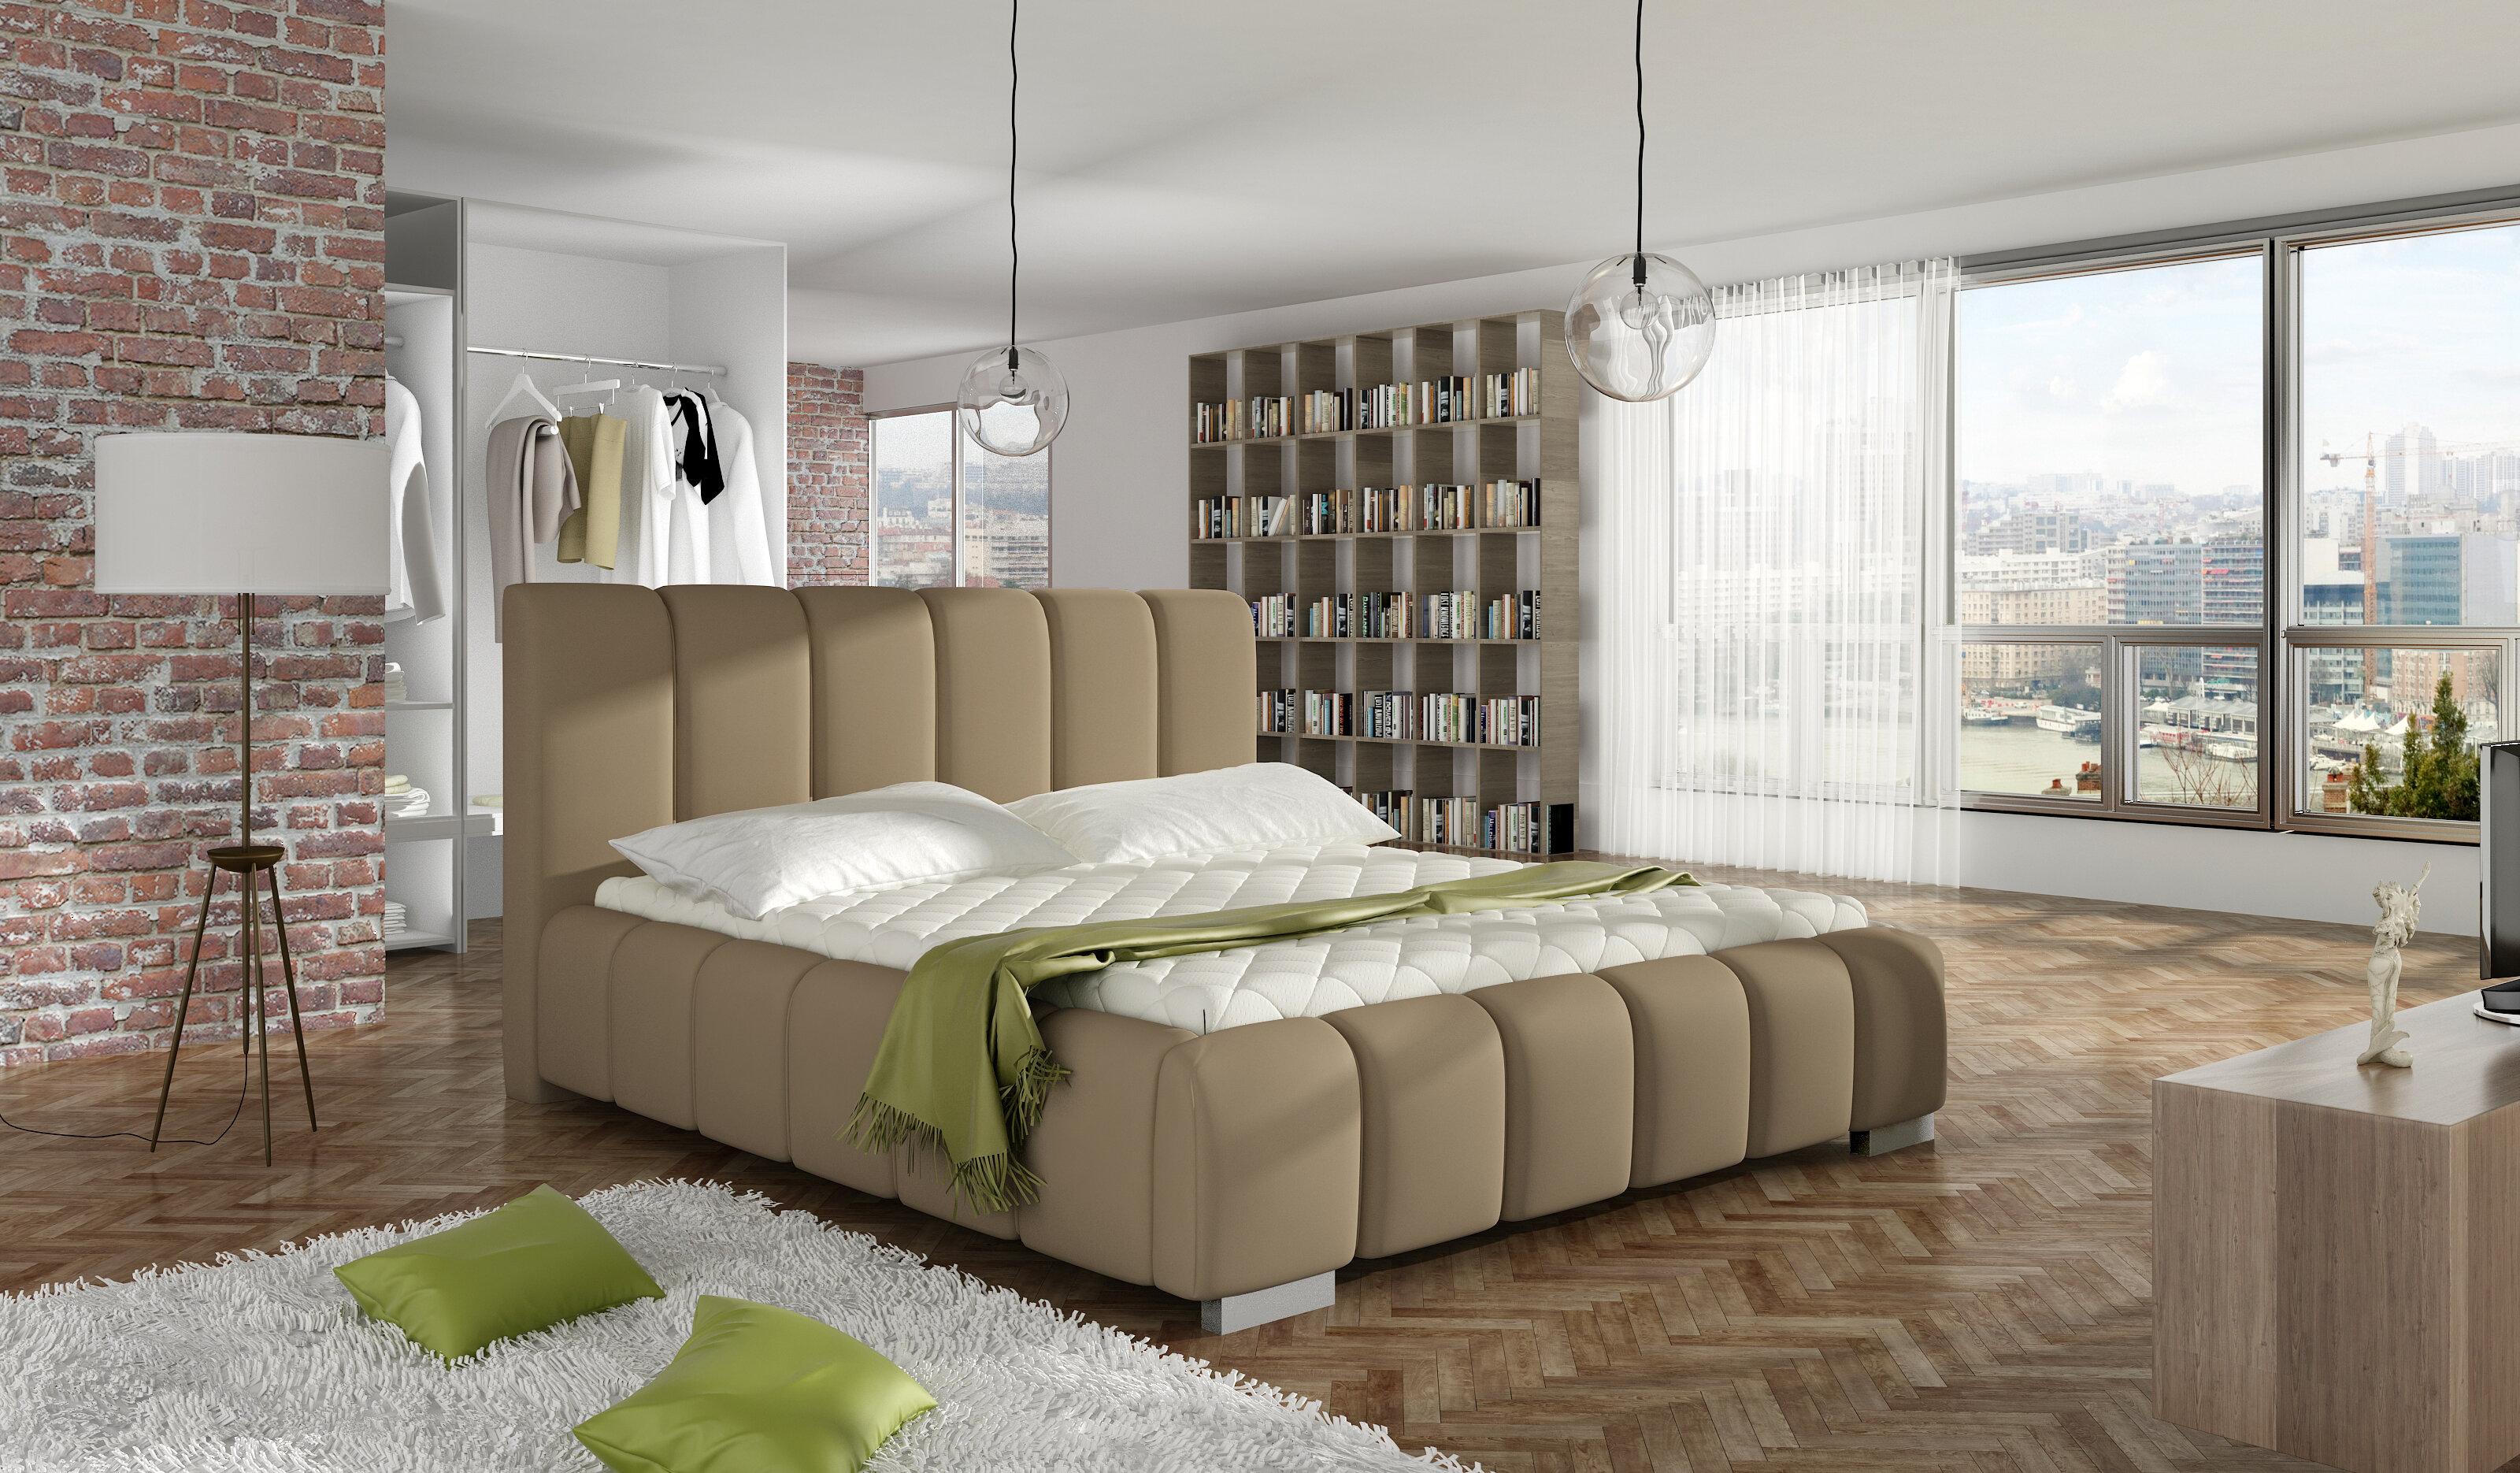 Lits Hokku Designs Caracteristiques Matelas Inclus Wayfair Ca